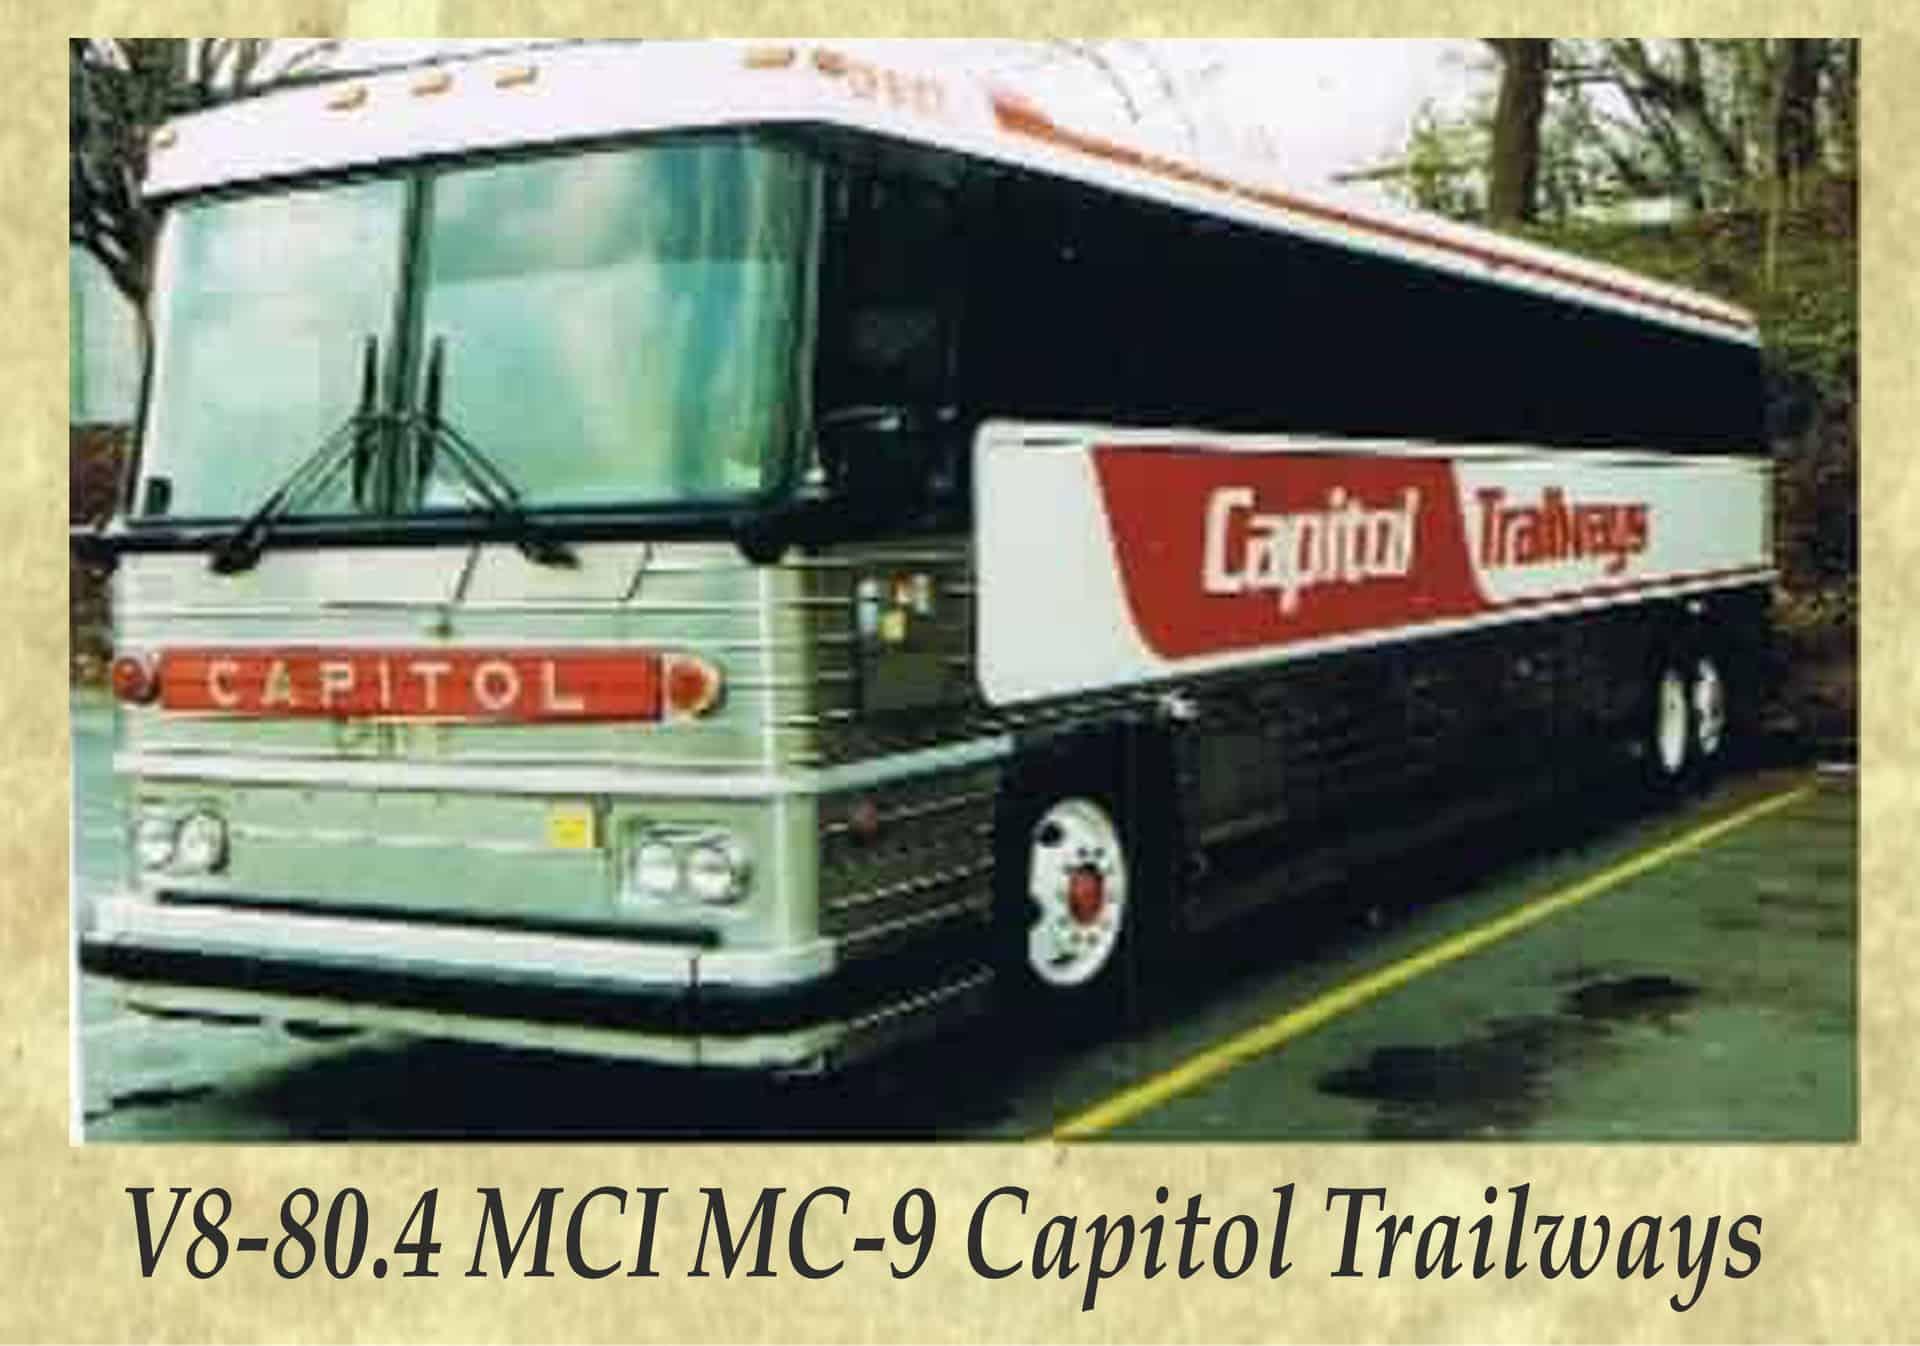 V8-80.4 MCI MC-9 Capitol Trailways